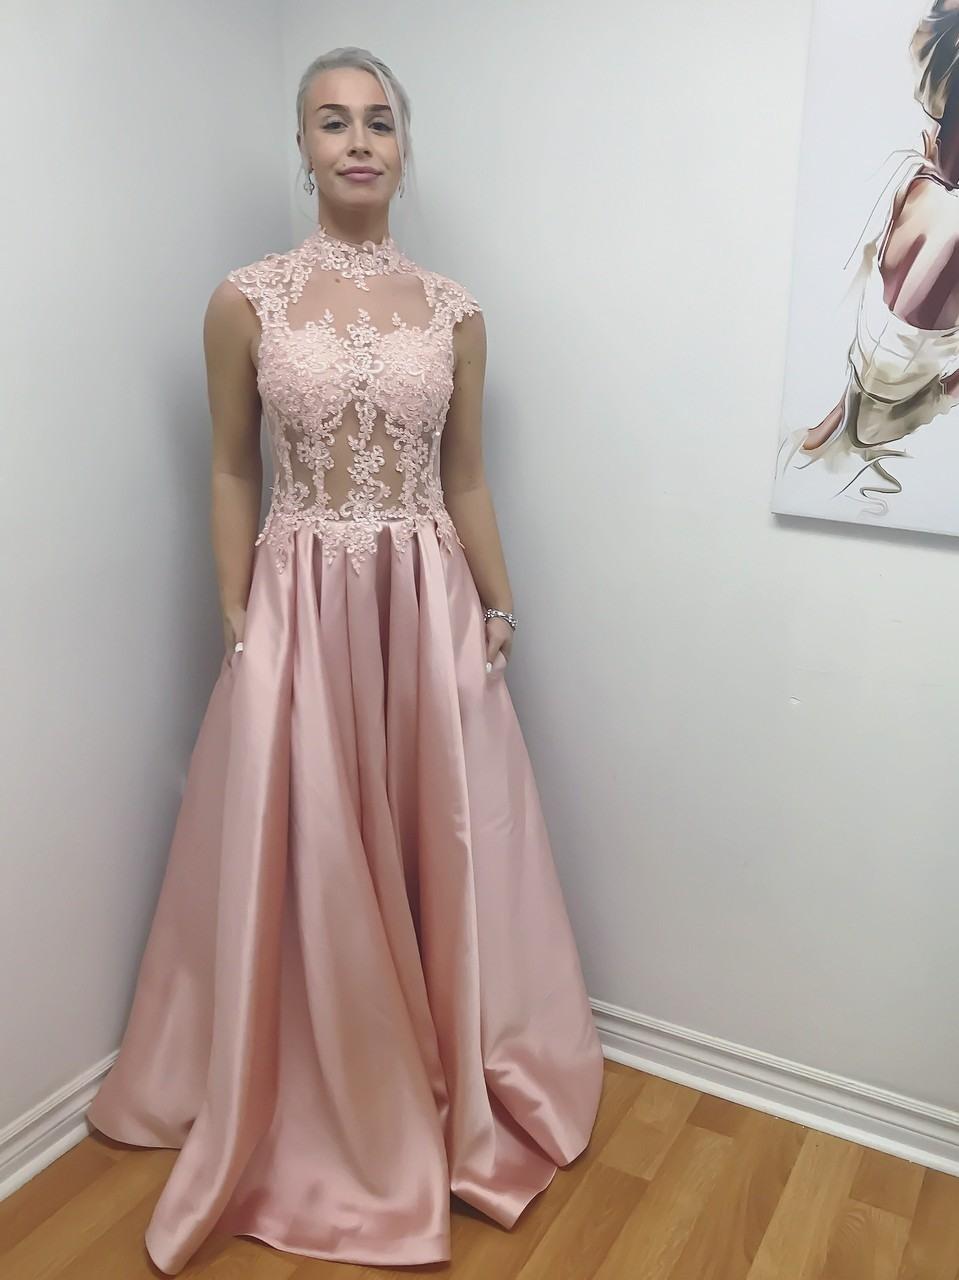 10 Luxus Abendkleider Lang Elegant Spezialgebiet15 Einzigartig Abendkleider Lang Elegant Boutique